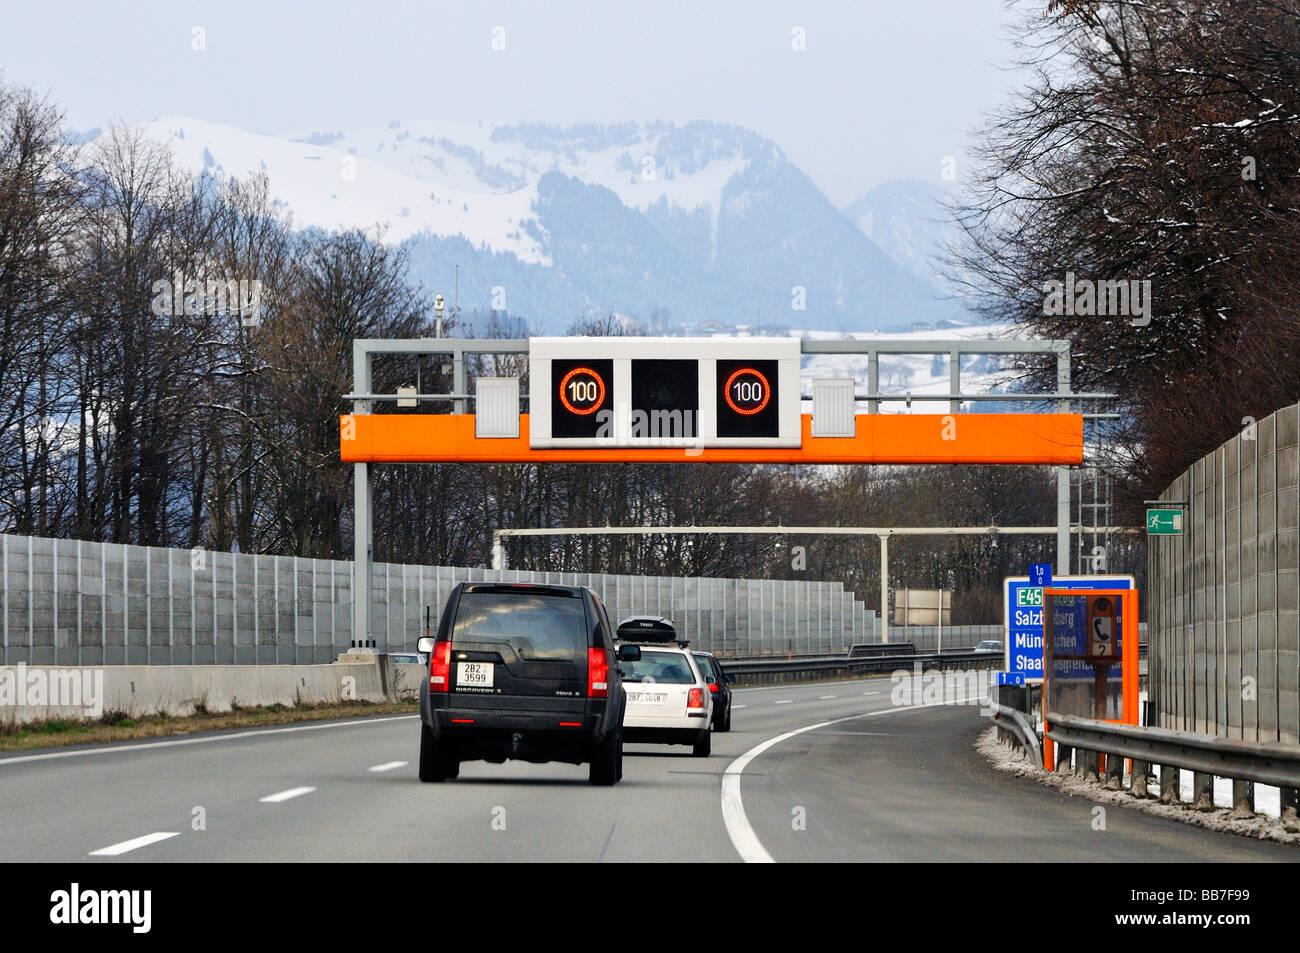 100 kilometer per hour, speed limit on the freeway, Tyrol, Austria, Europe - Stock Image